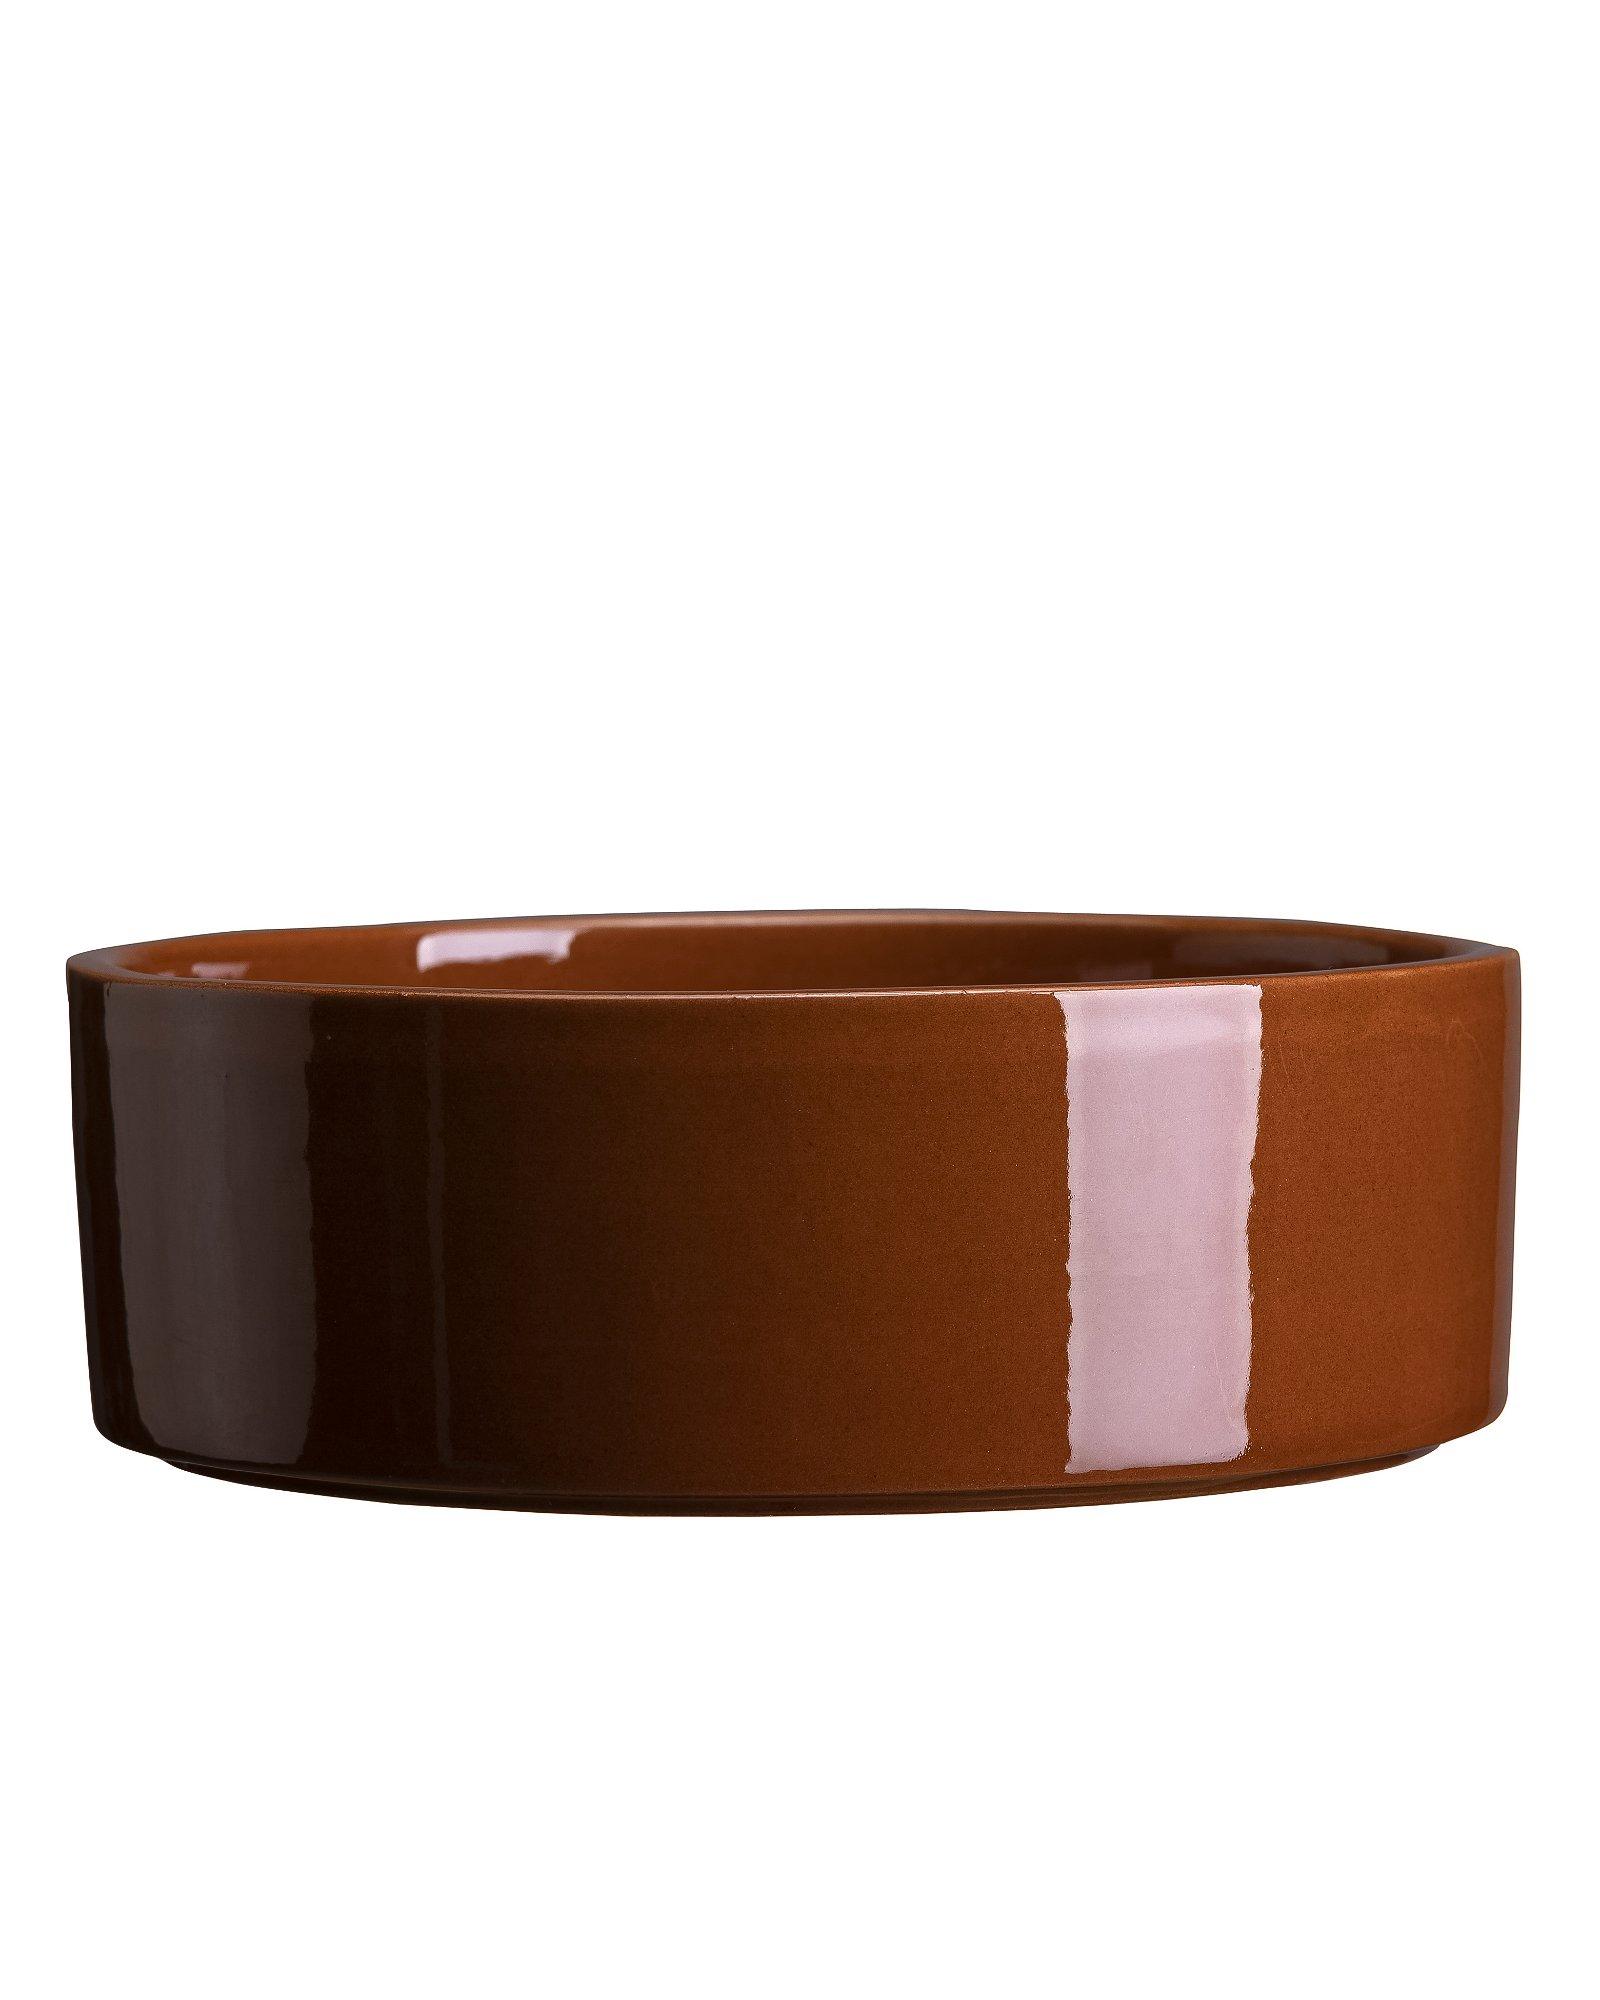 Bergs Potter, The Hoff Pot GLAZED: Rusty Red, 30 cm, Underfad